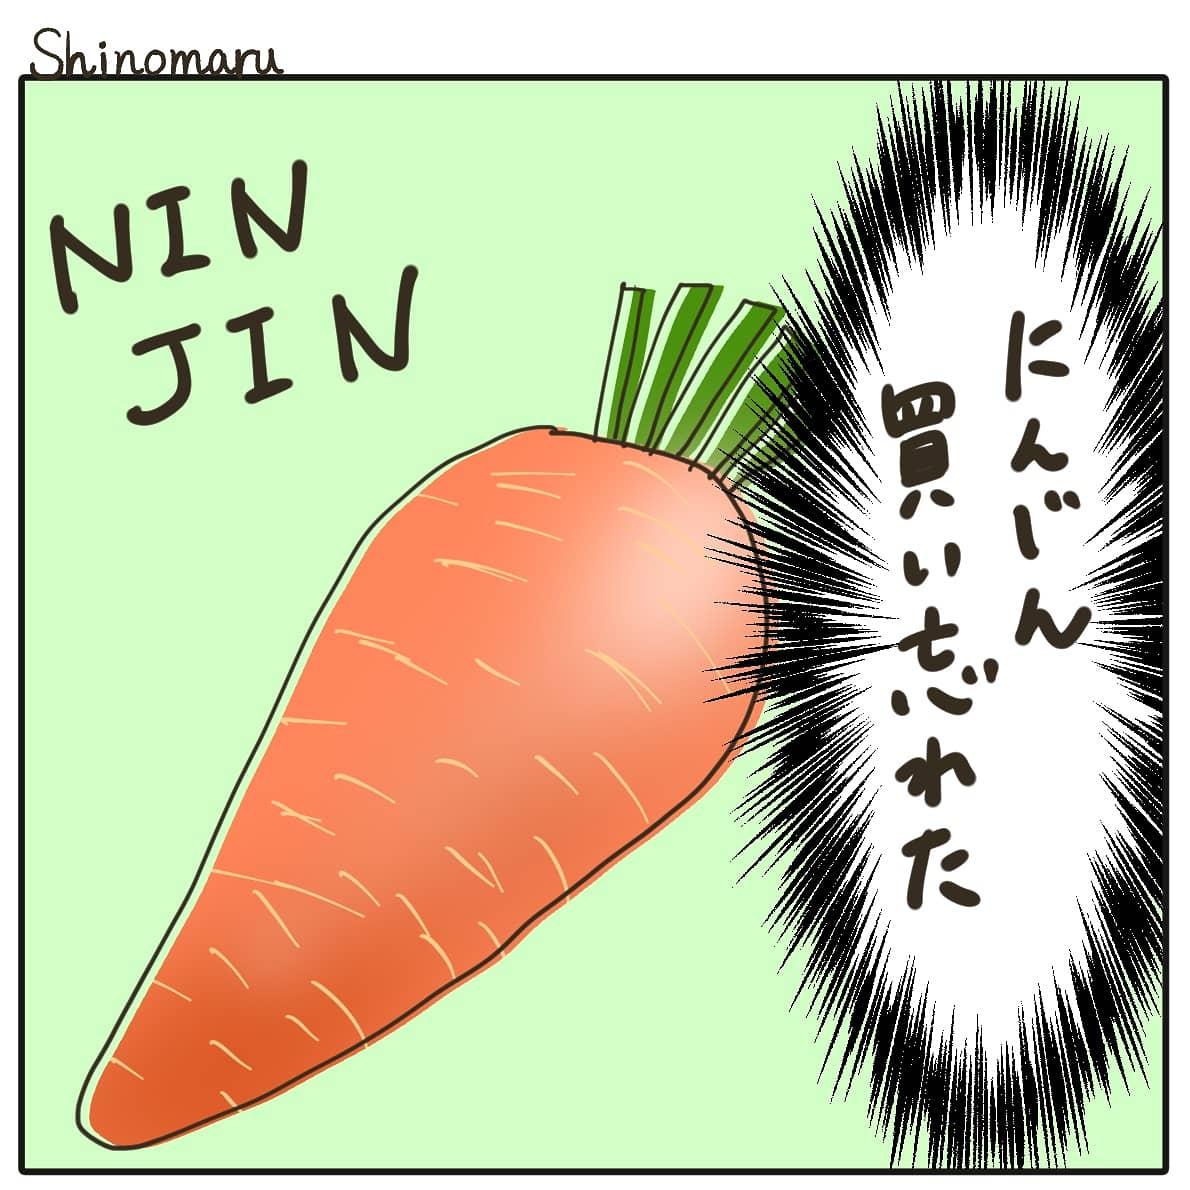 f:id:Shinomaru:20210517185723j:plain